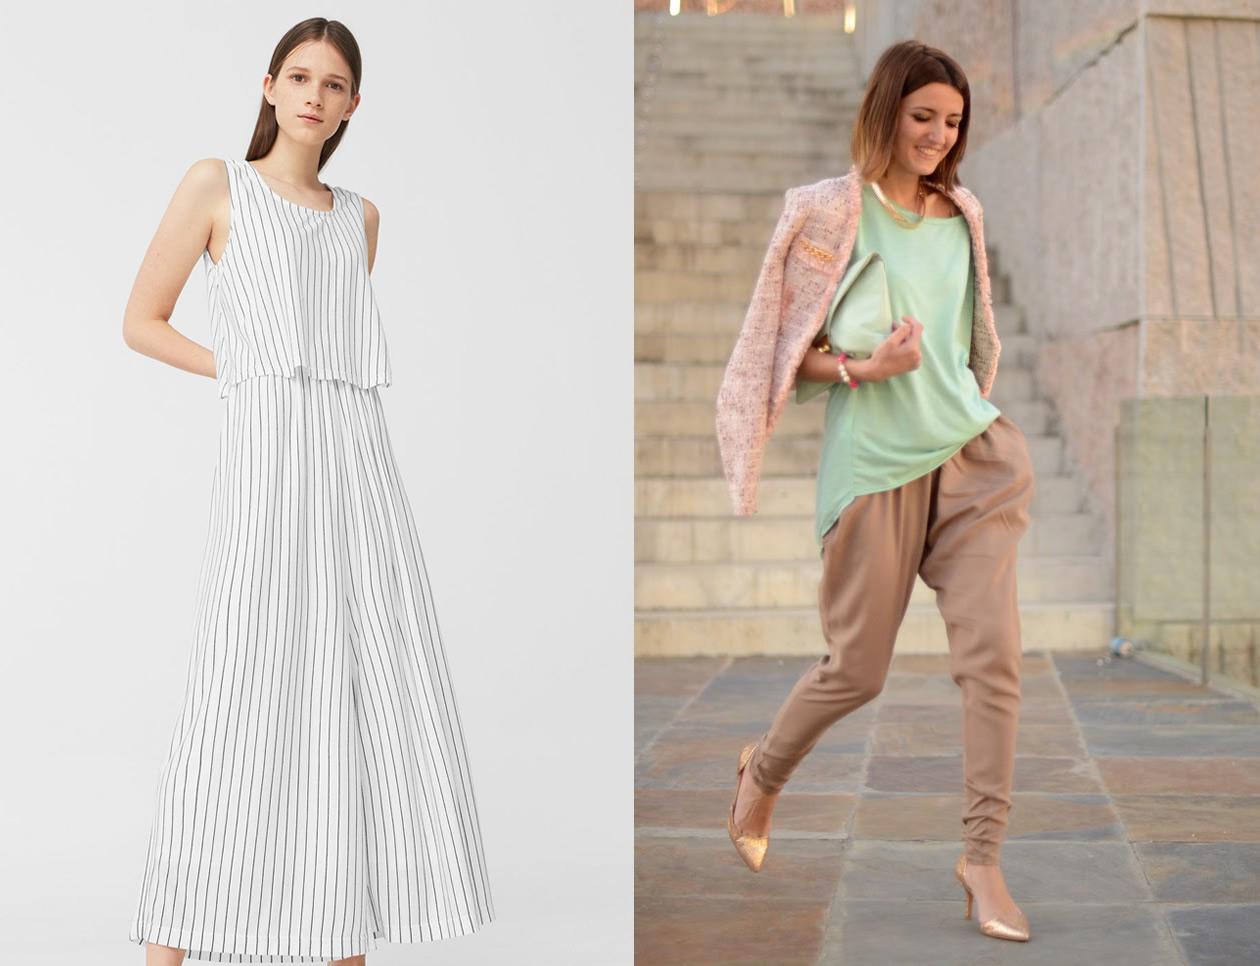 wearing pants to a wedding - Wedding Decor Ideas